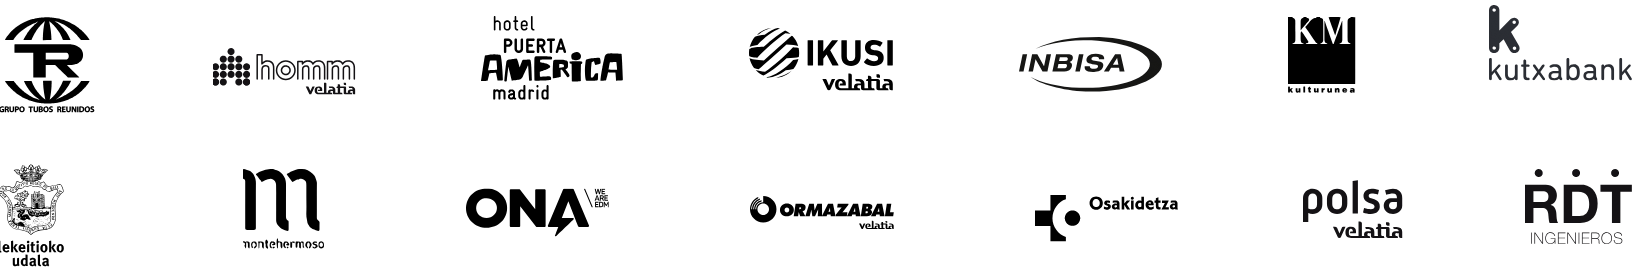 Logos_web_2020_3